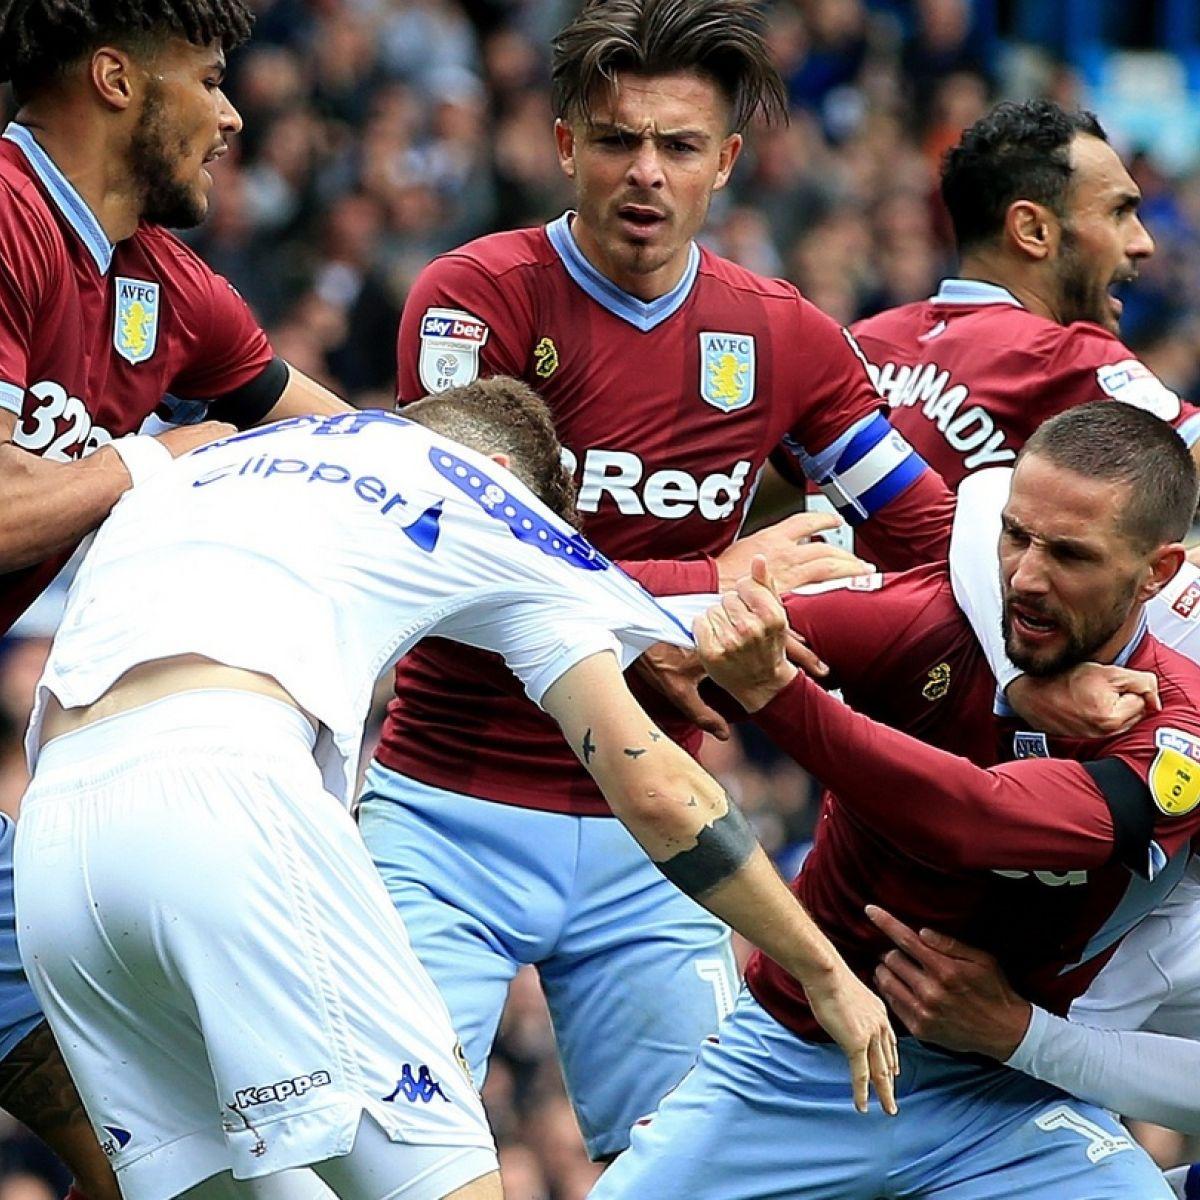 Bielsa: Leeds won't kick ball out if a Derby player is injured